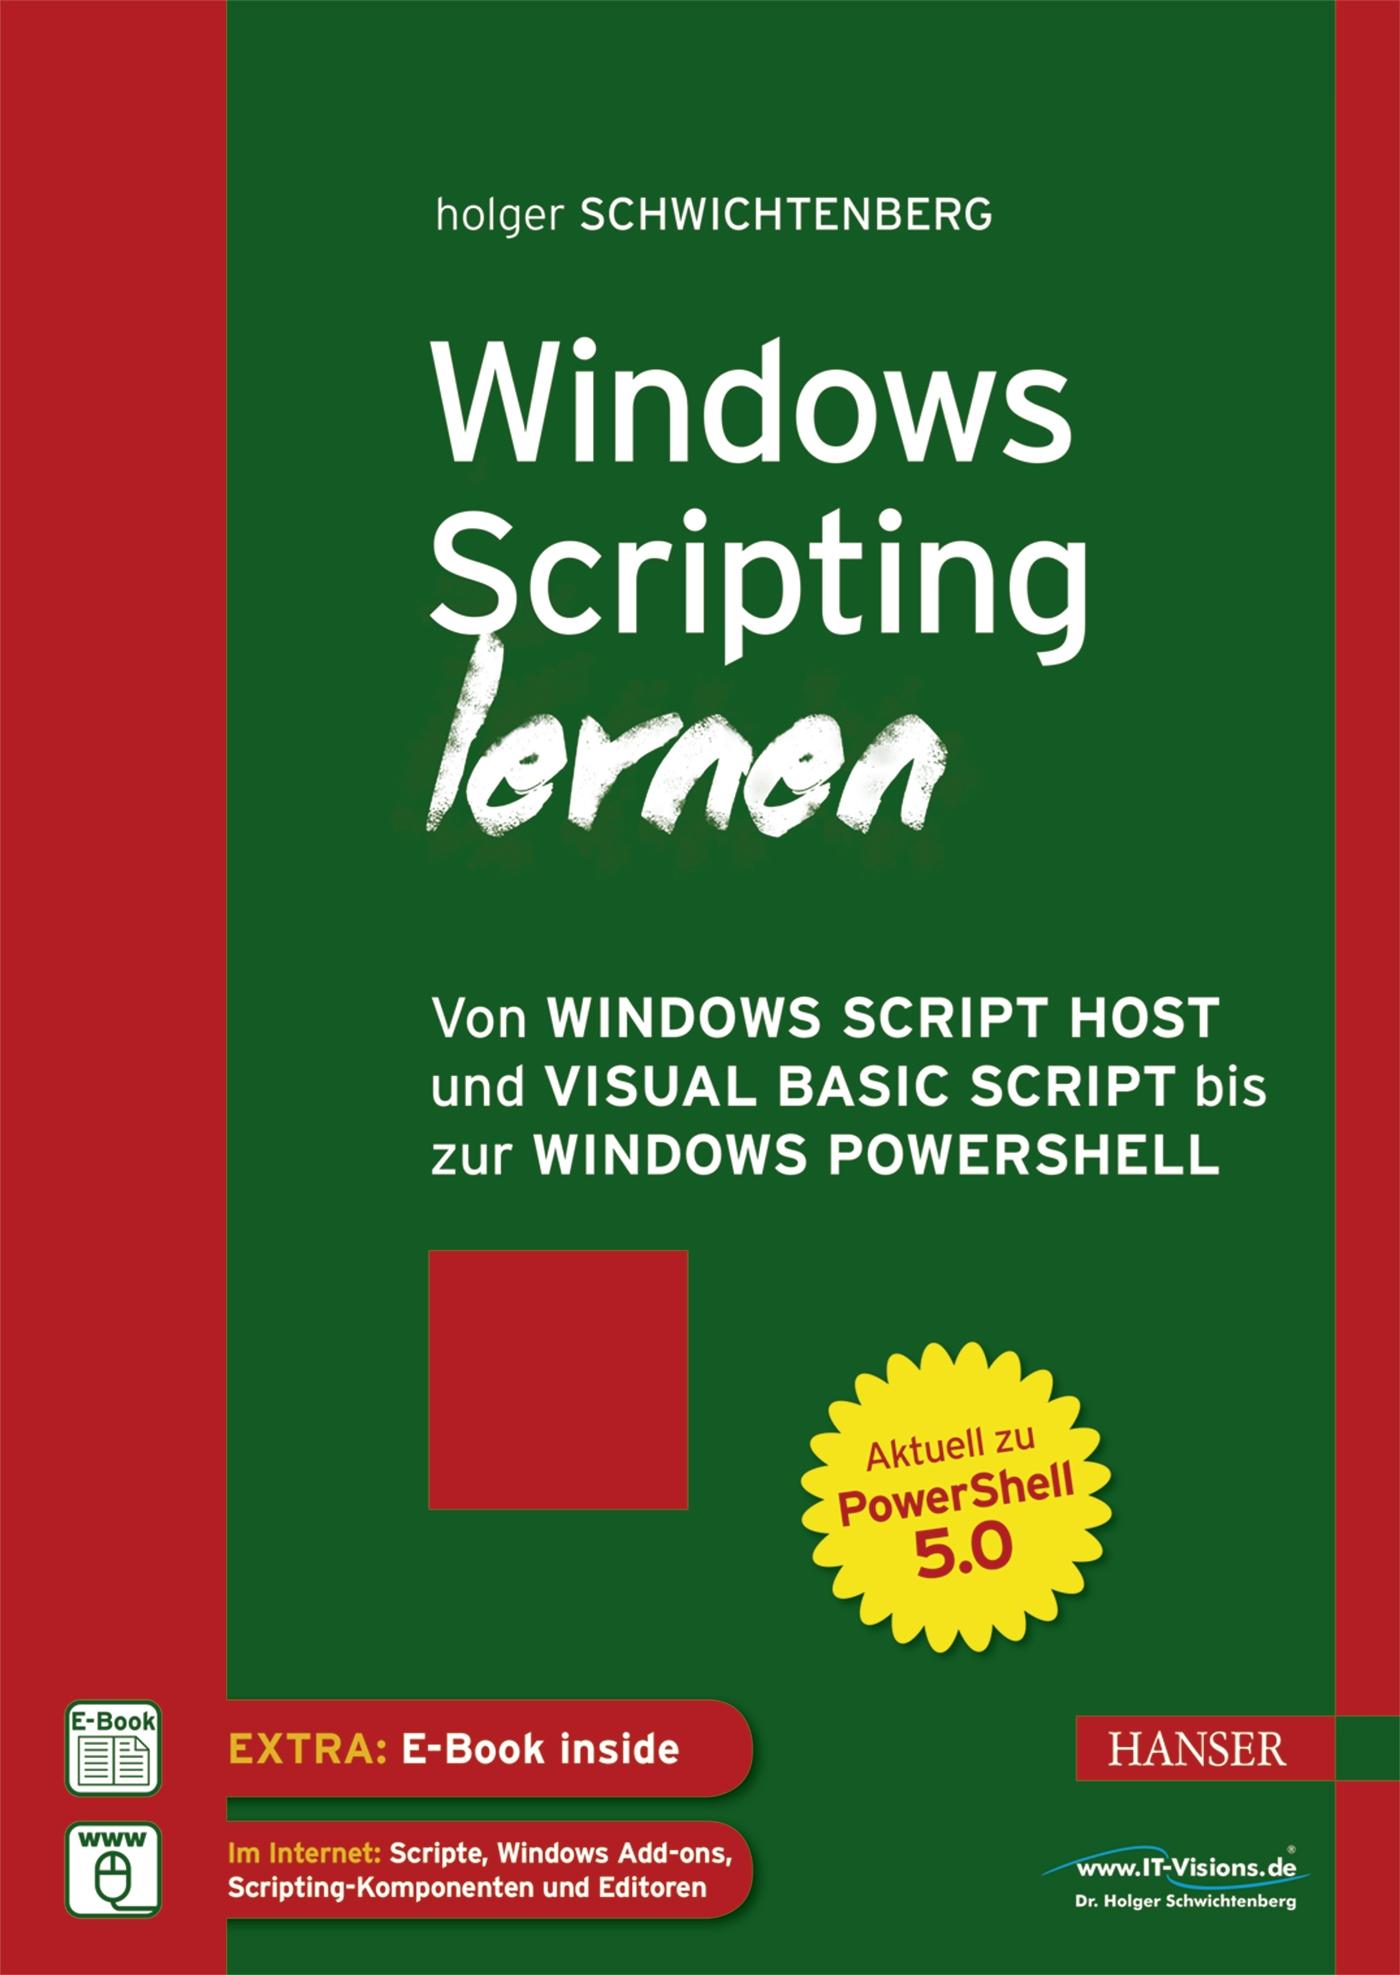 windows scripting lernen hanser fachbuch. Black Bedroom Furniture Sets. Home Design Ideas